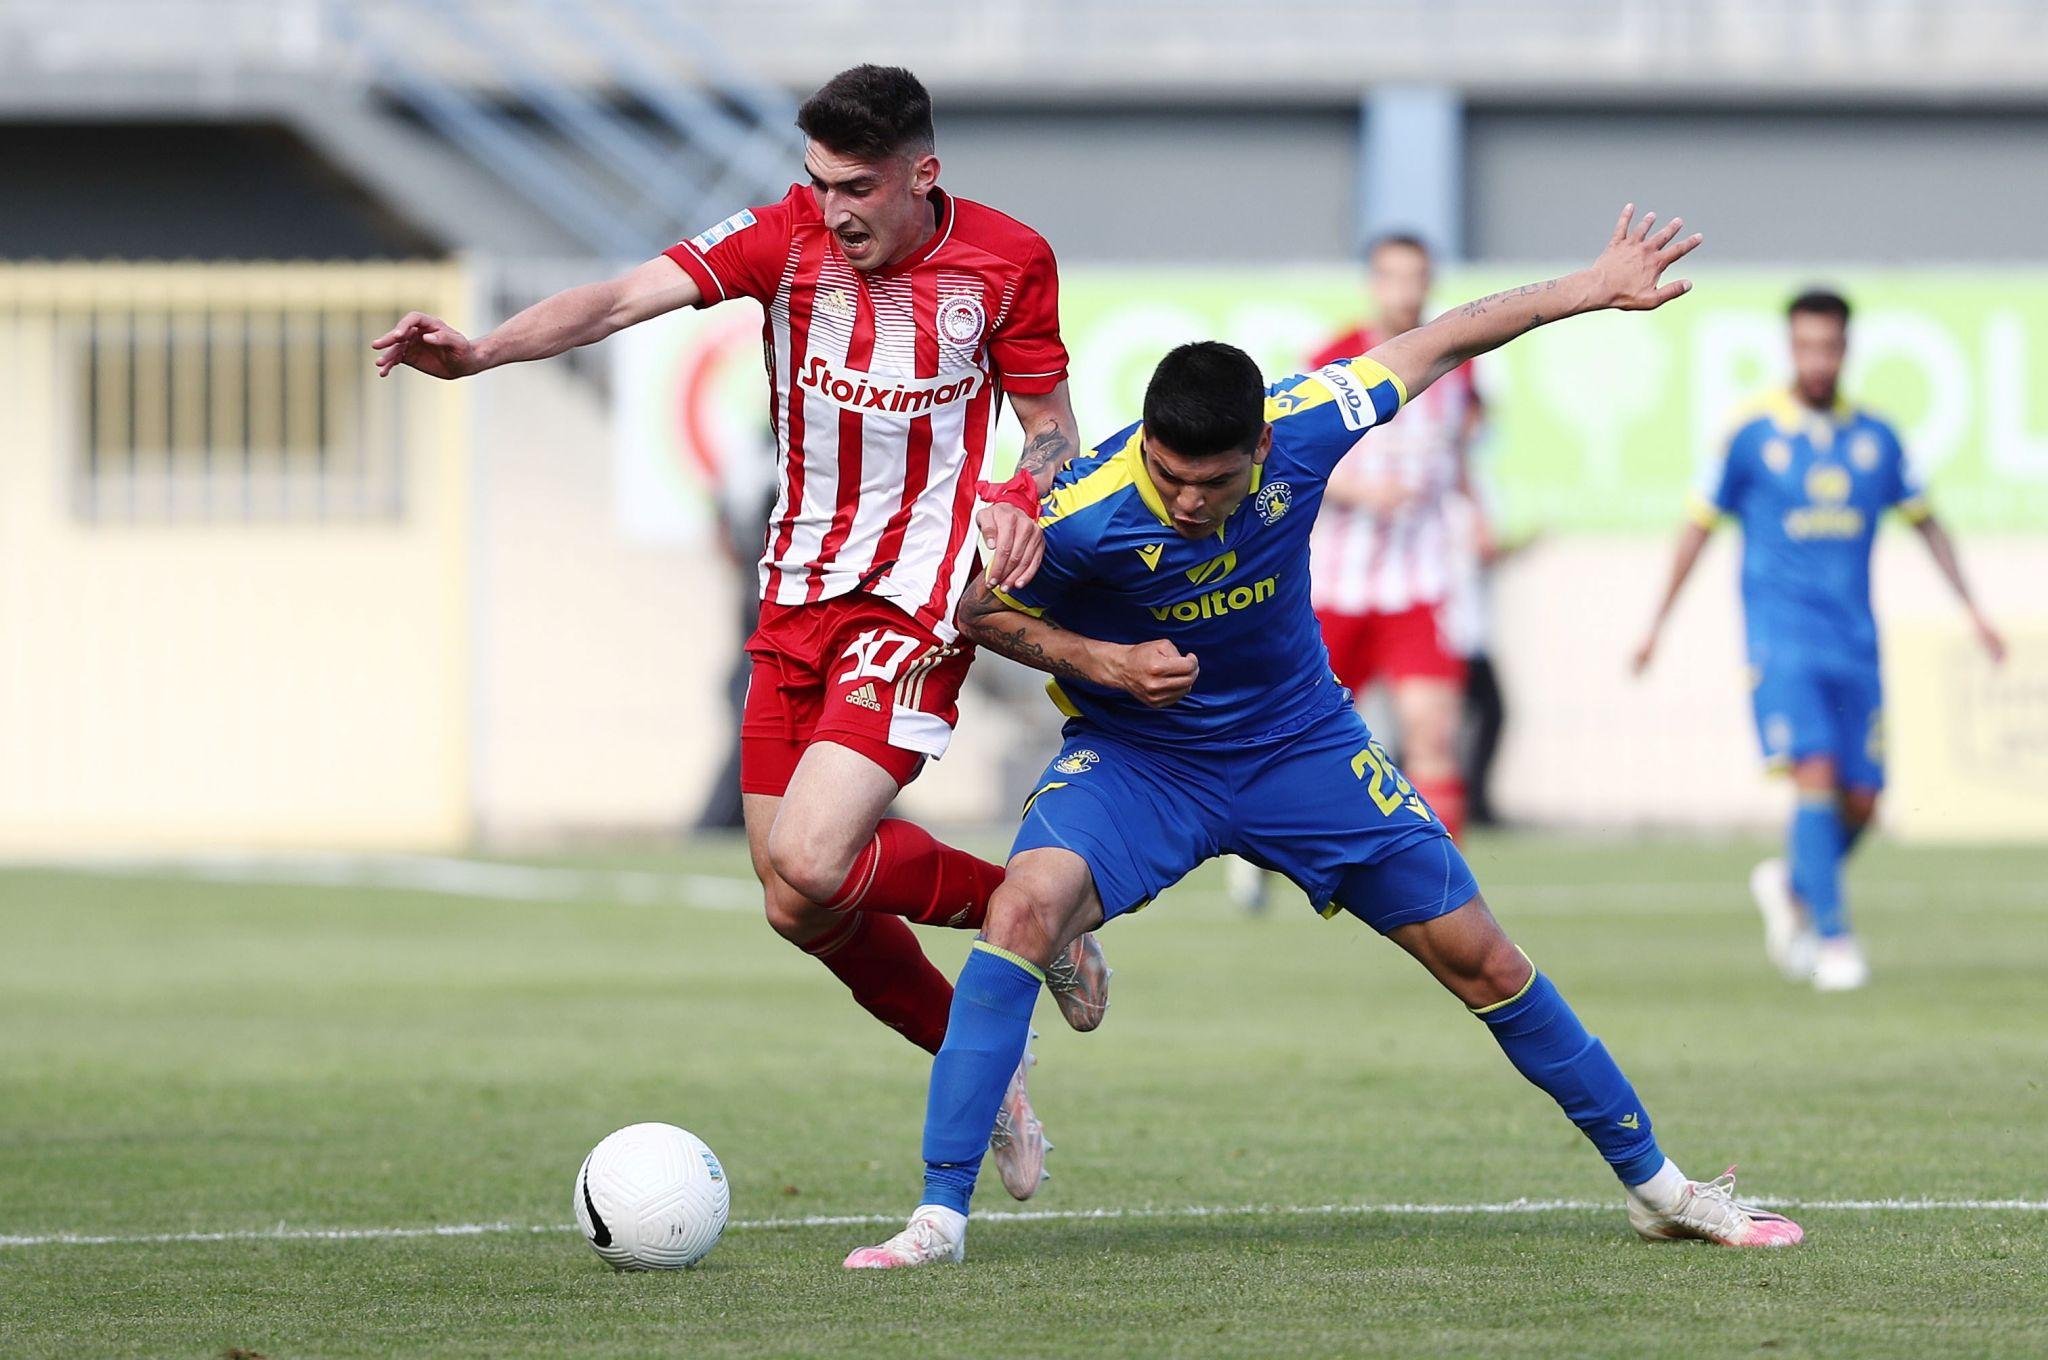 A goalless draw in Tripolis